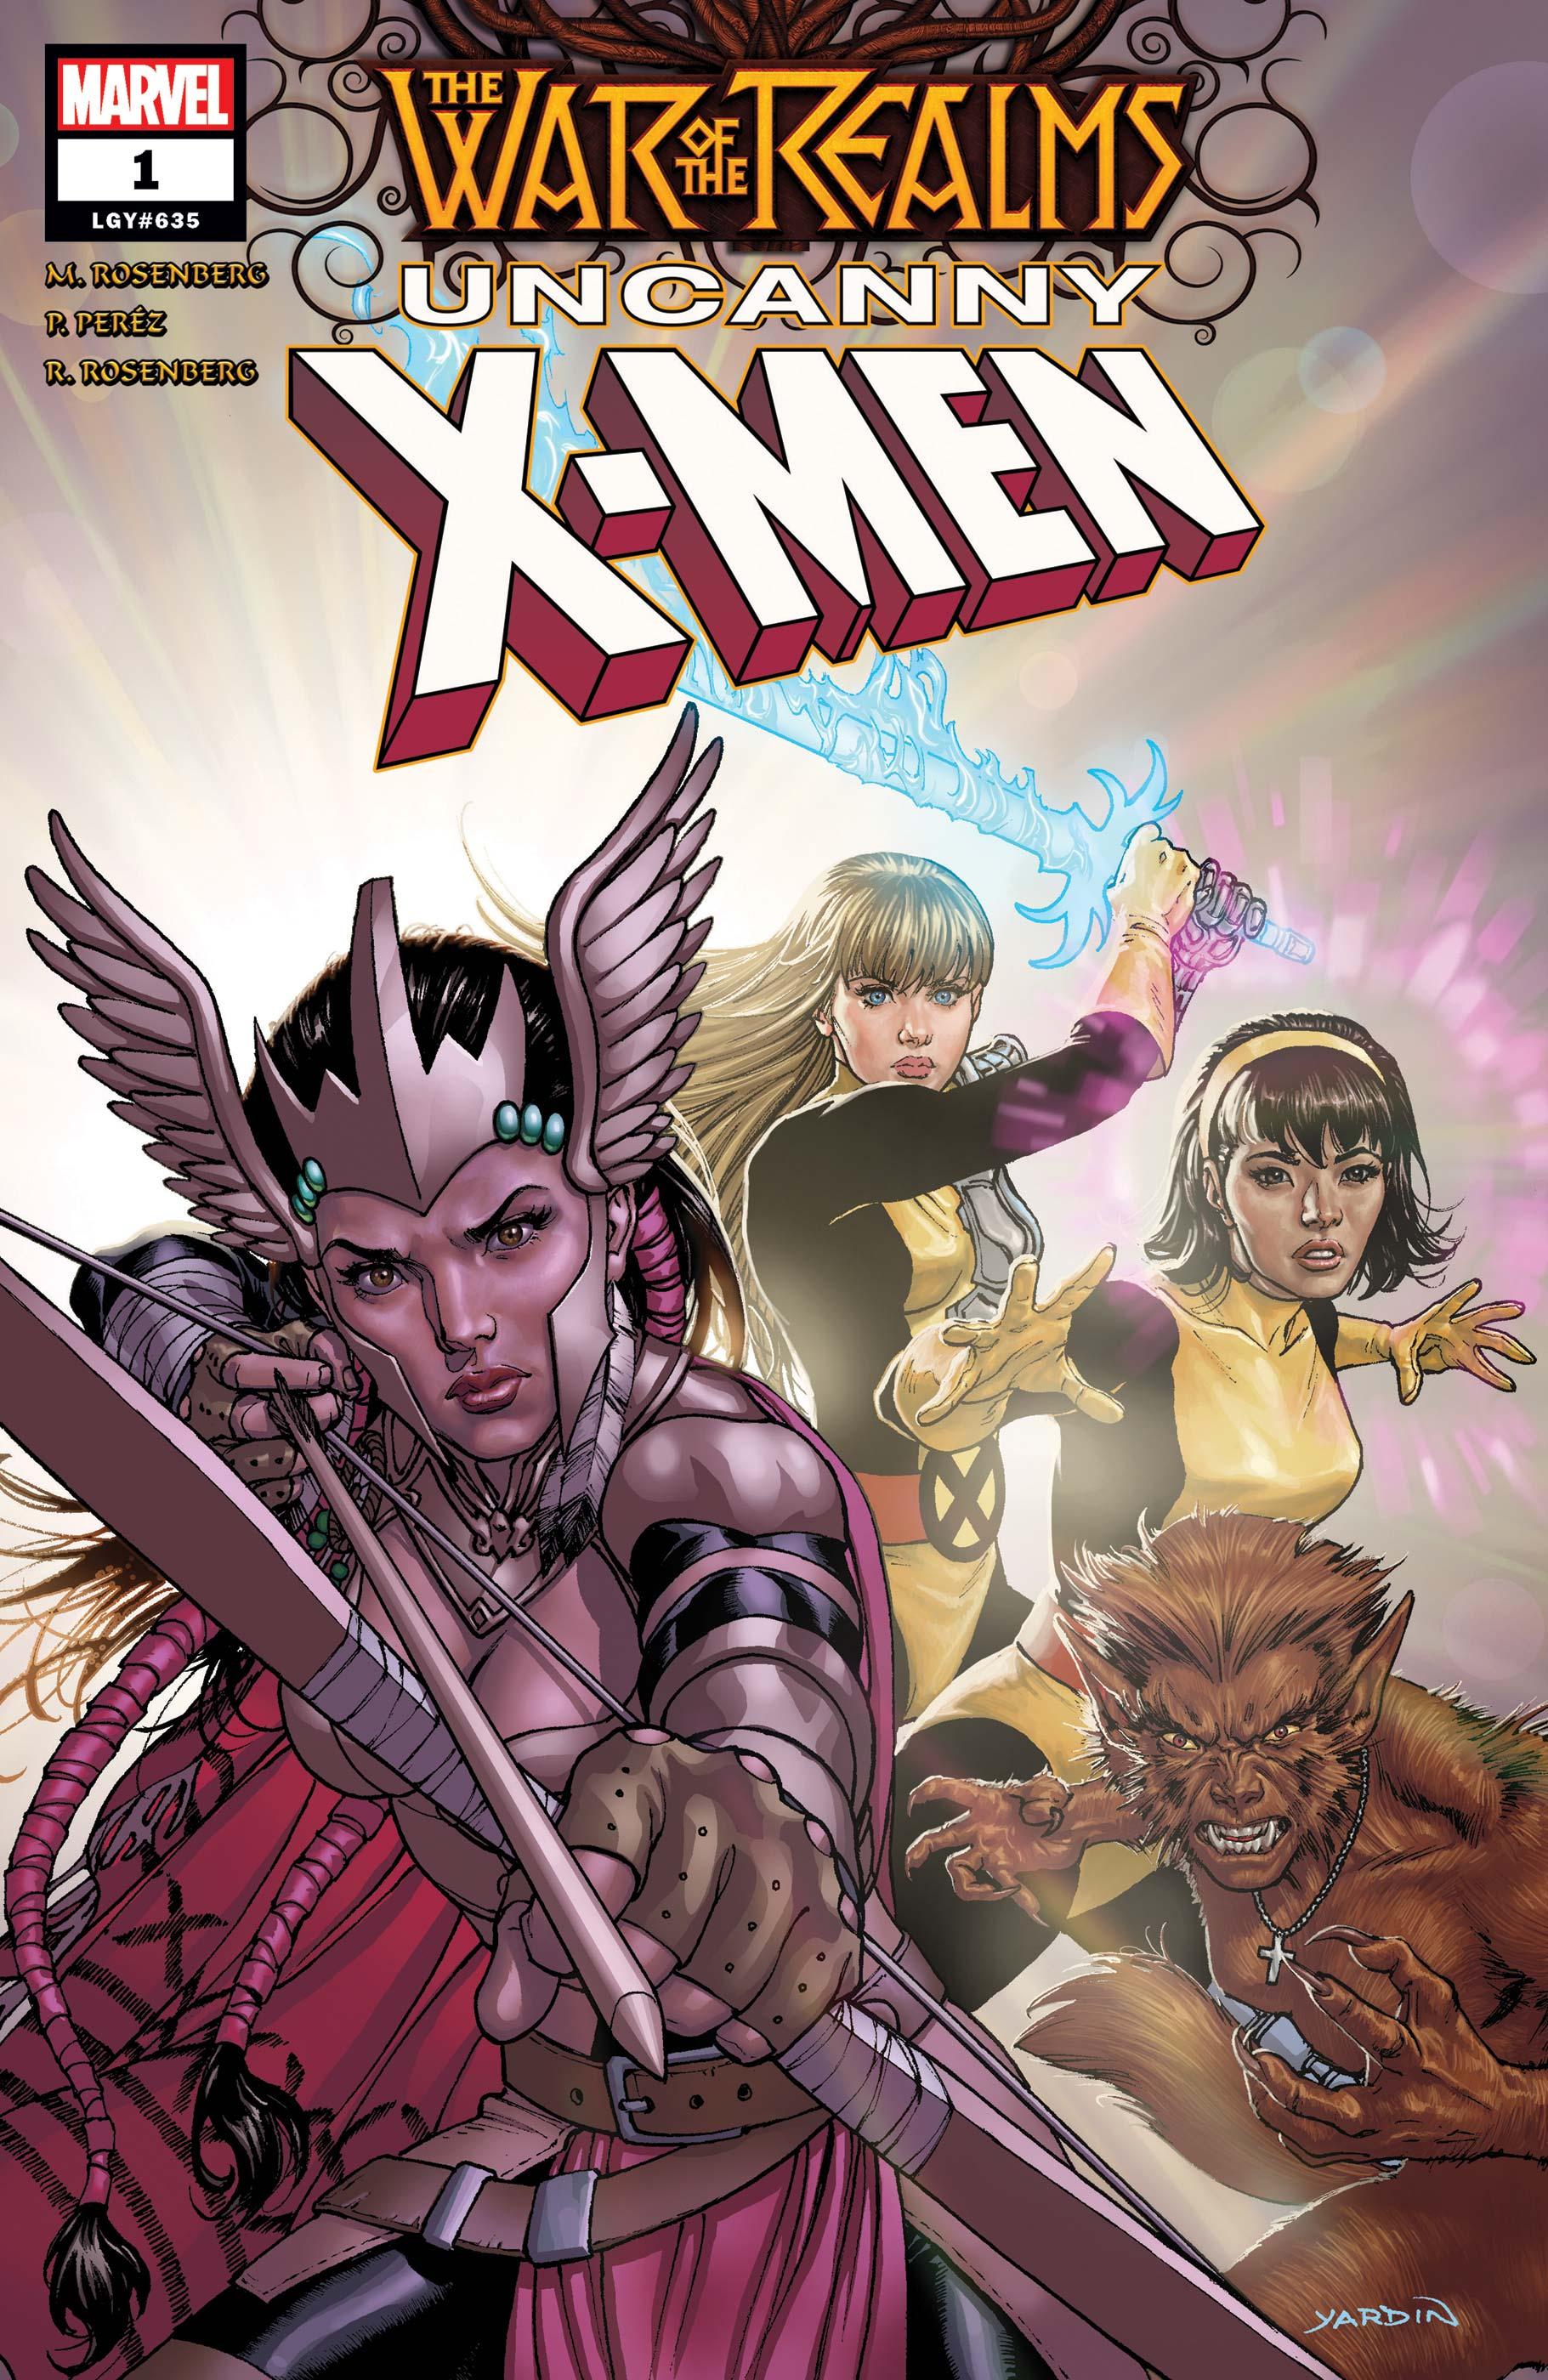 War of the Realms: Uncanny X-Men (2019) #1